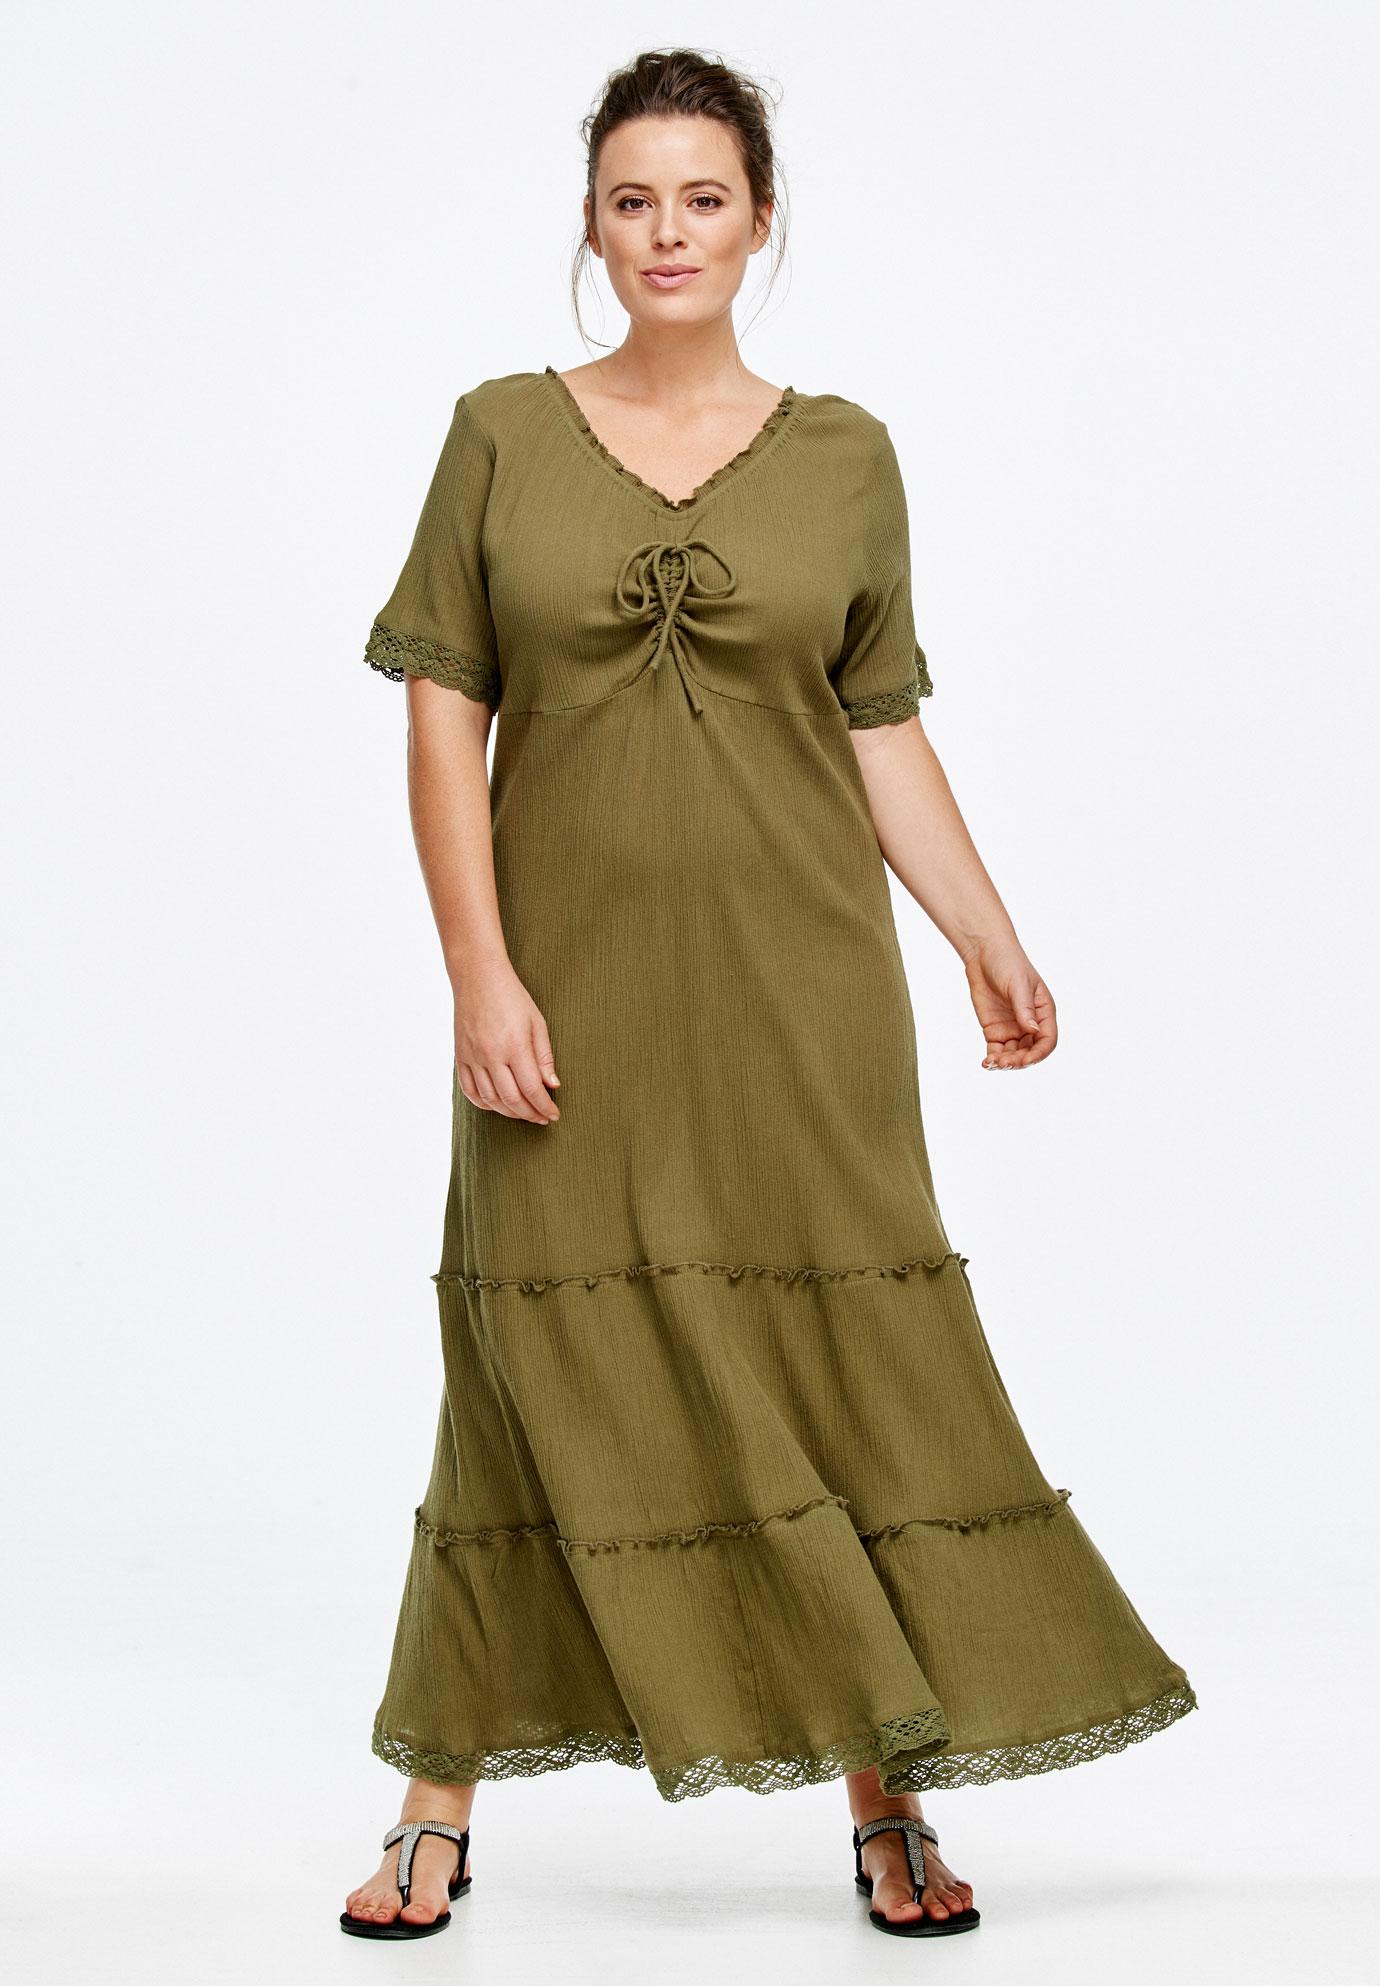 Gauze Maxi Dress By Ellos 174 Plus Size Dresses Roaman S